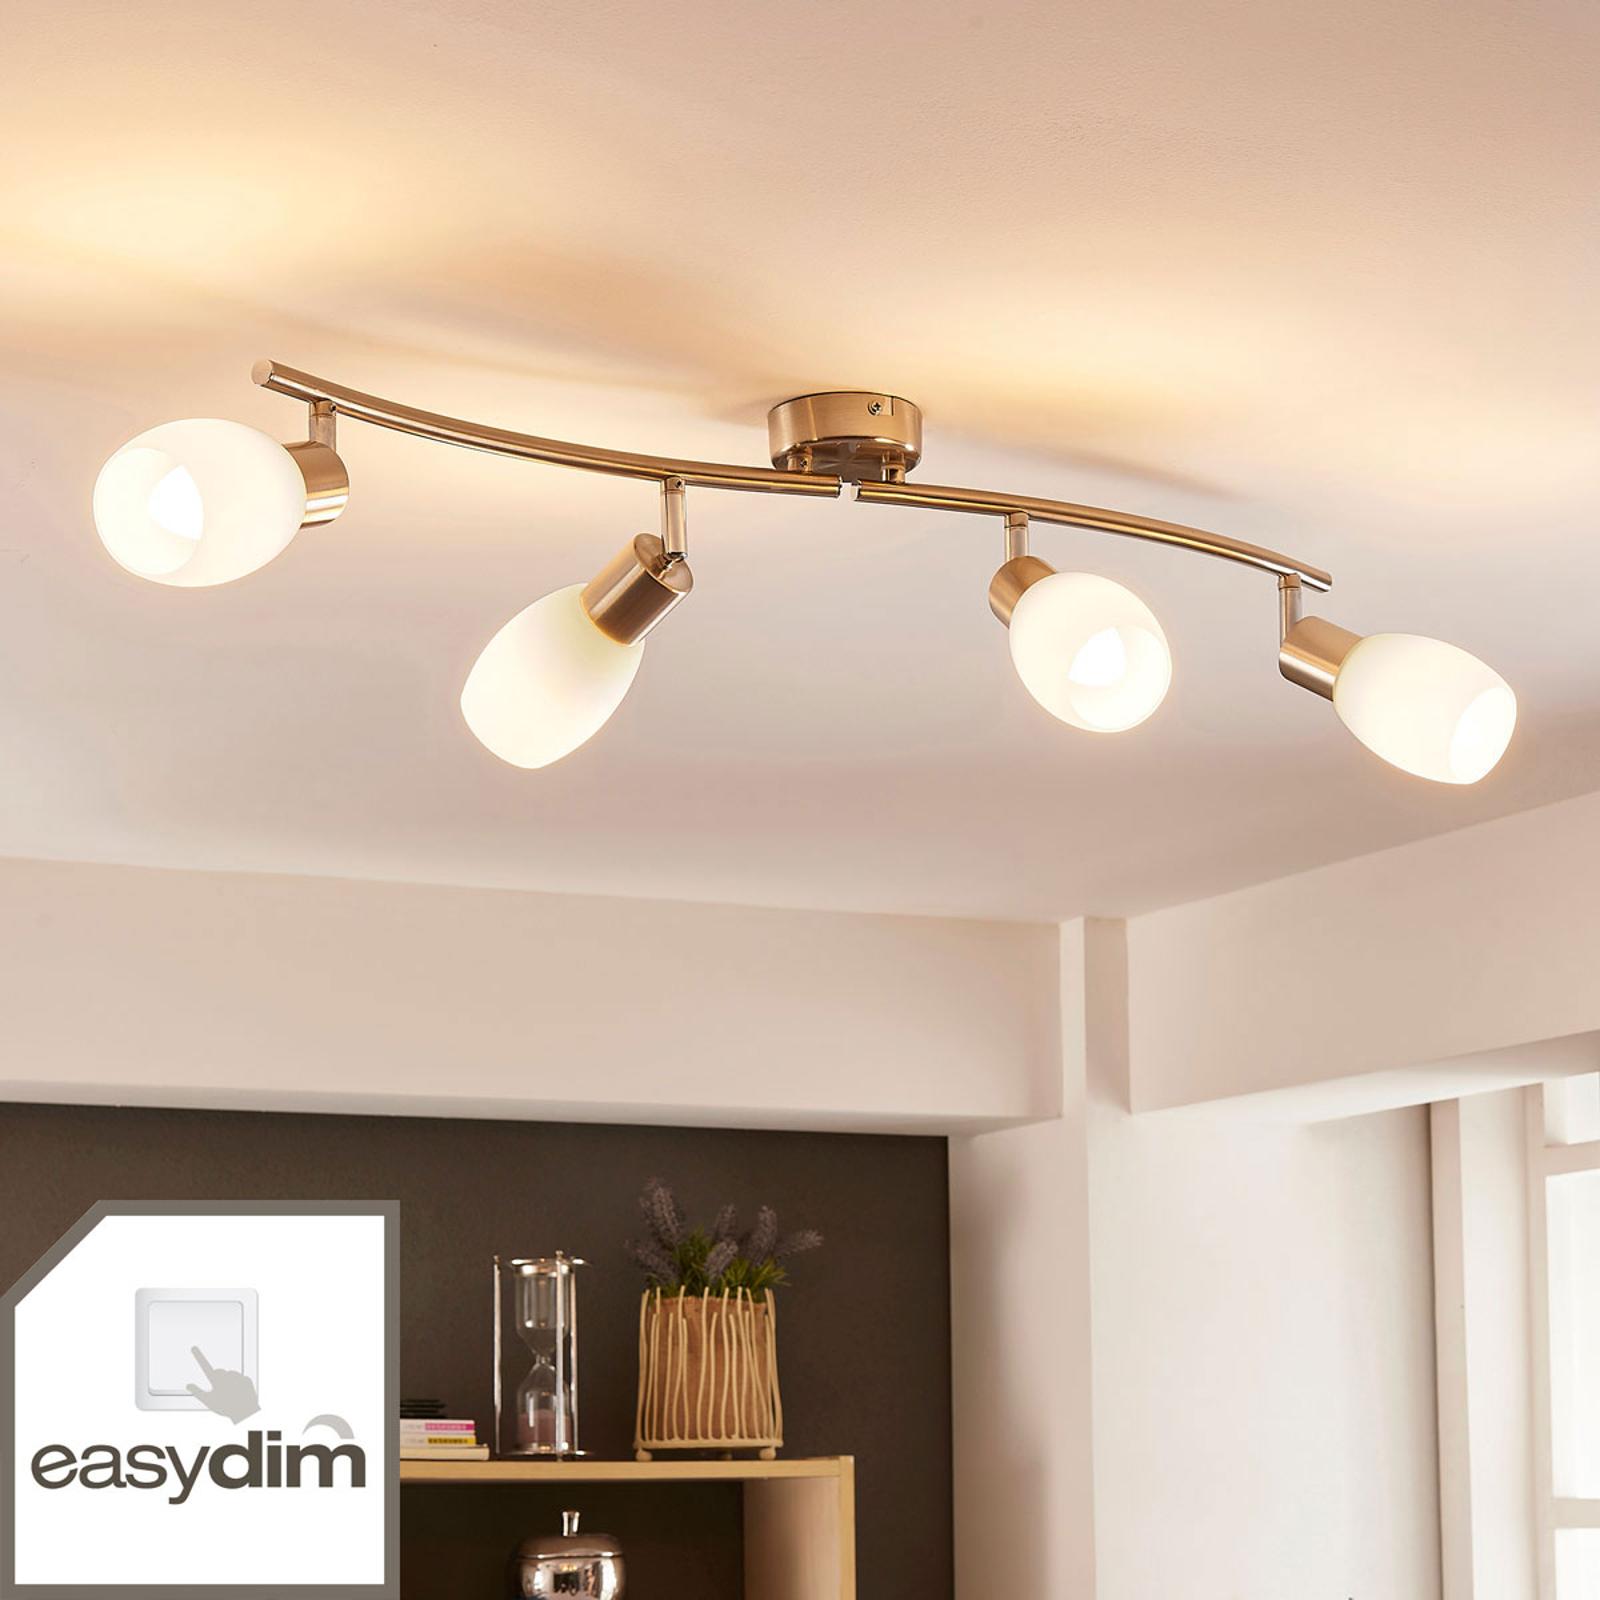 LED-taklampe Arda med fire lys, easydim